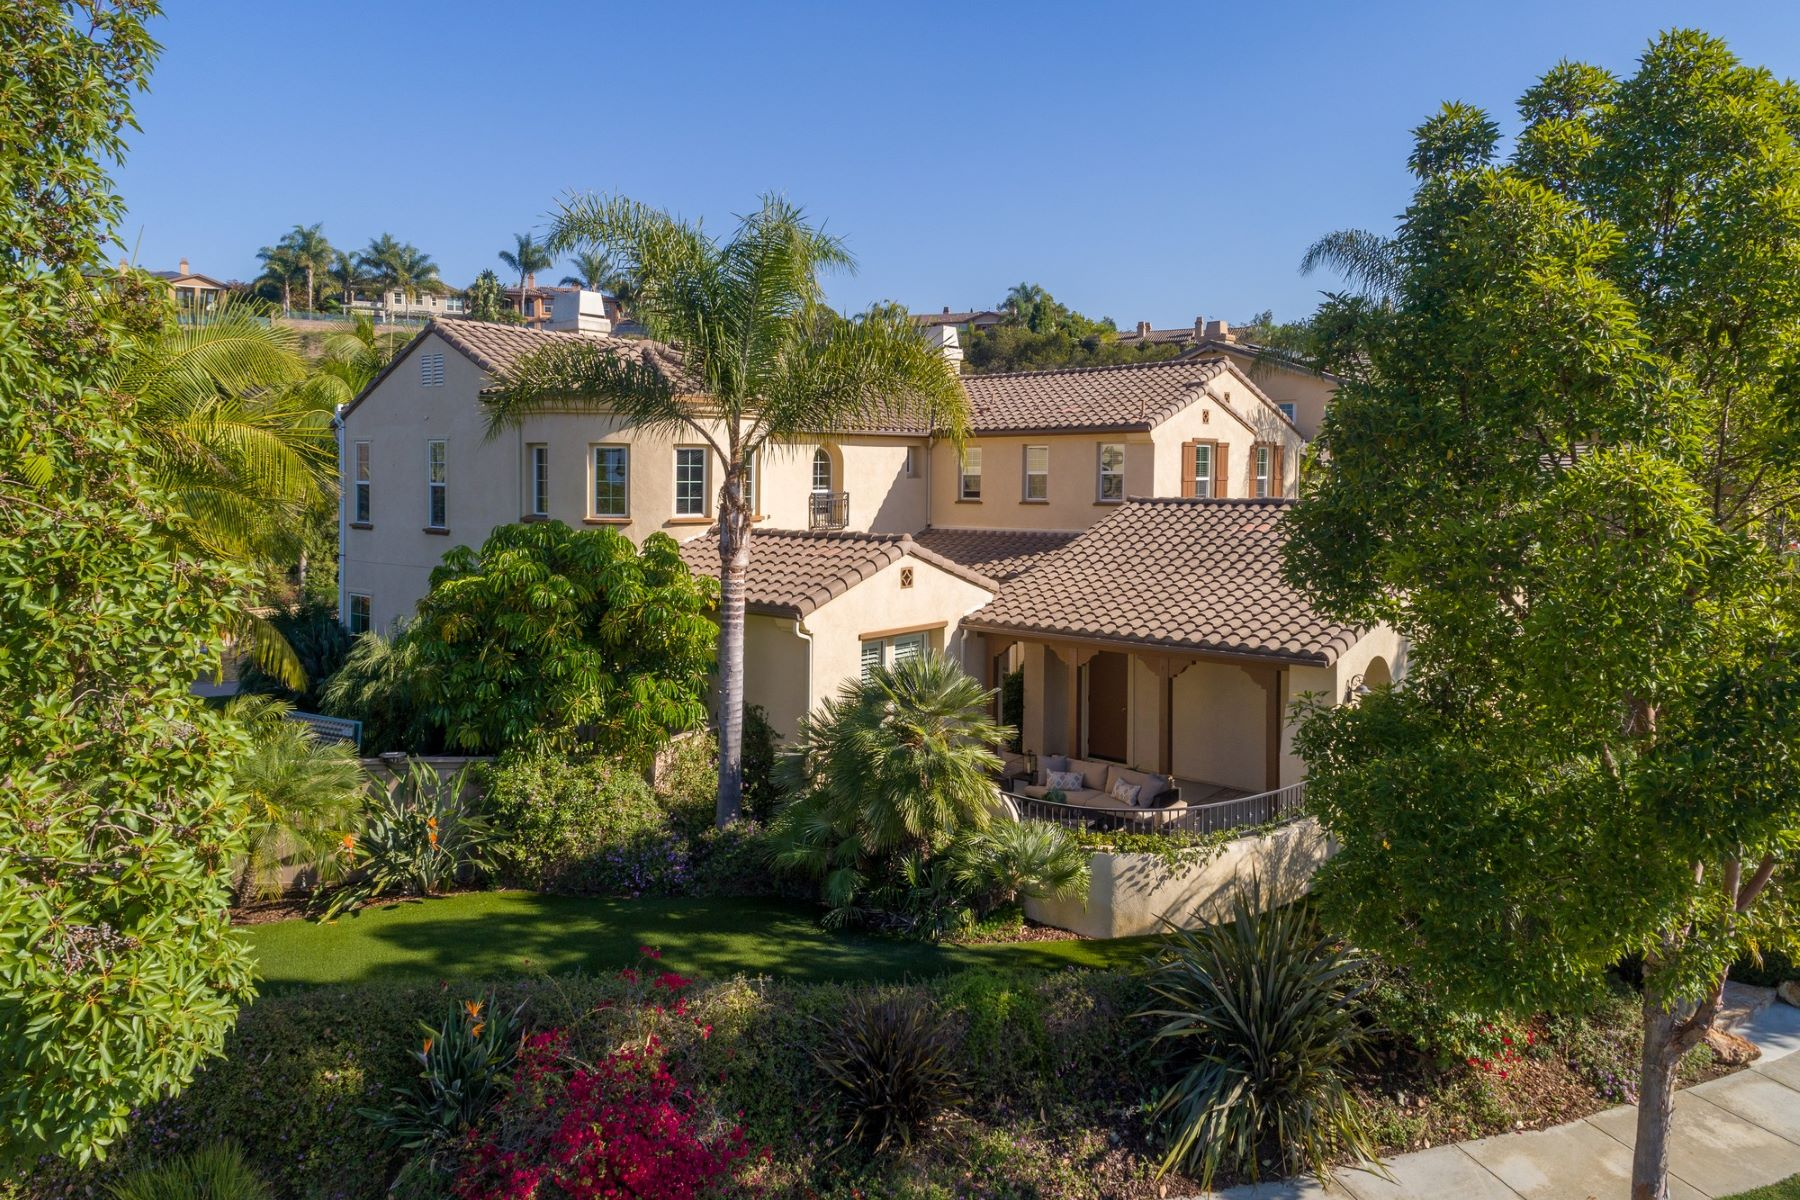 Single Family Home for Active at 7682 Sitio Manana 7682 Sitio Manana Carlsbad, California 92009 United States